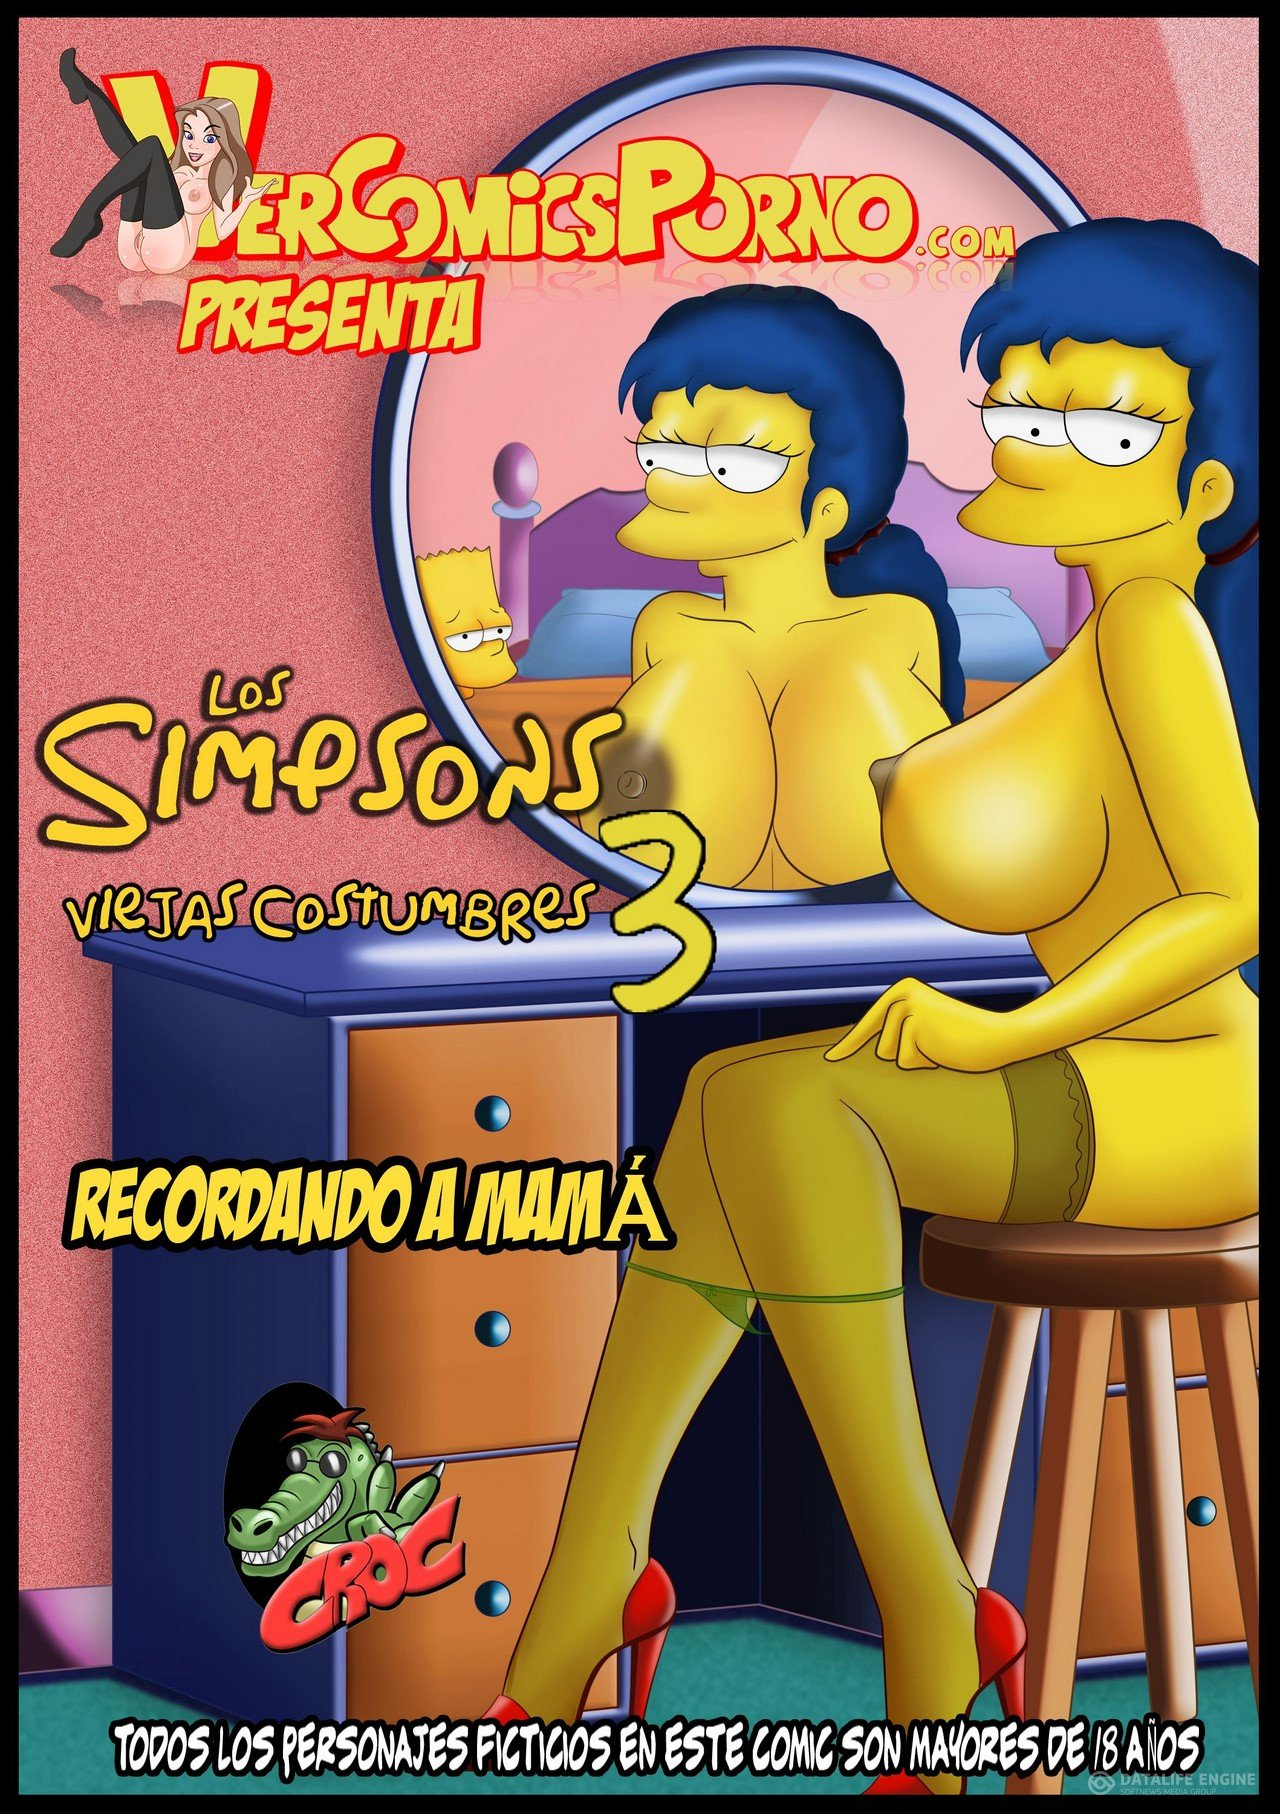 Recordando a mama - 00_Cover